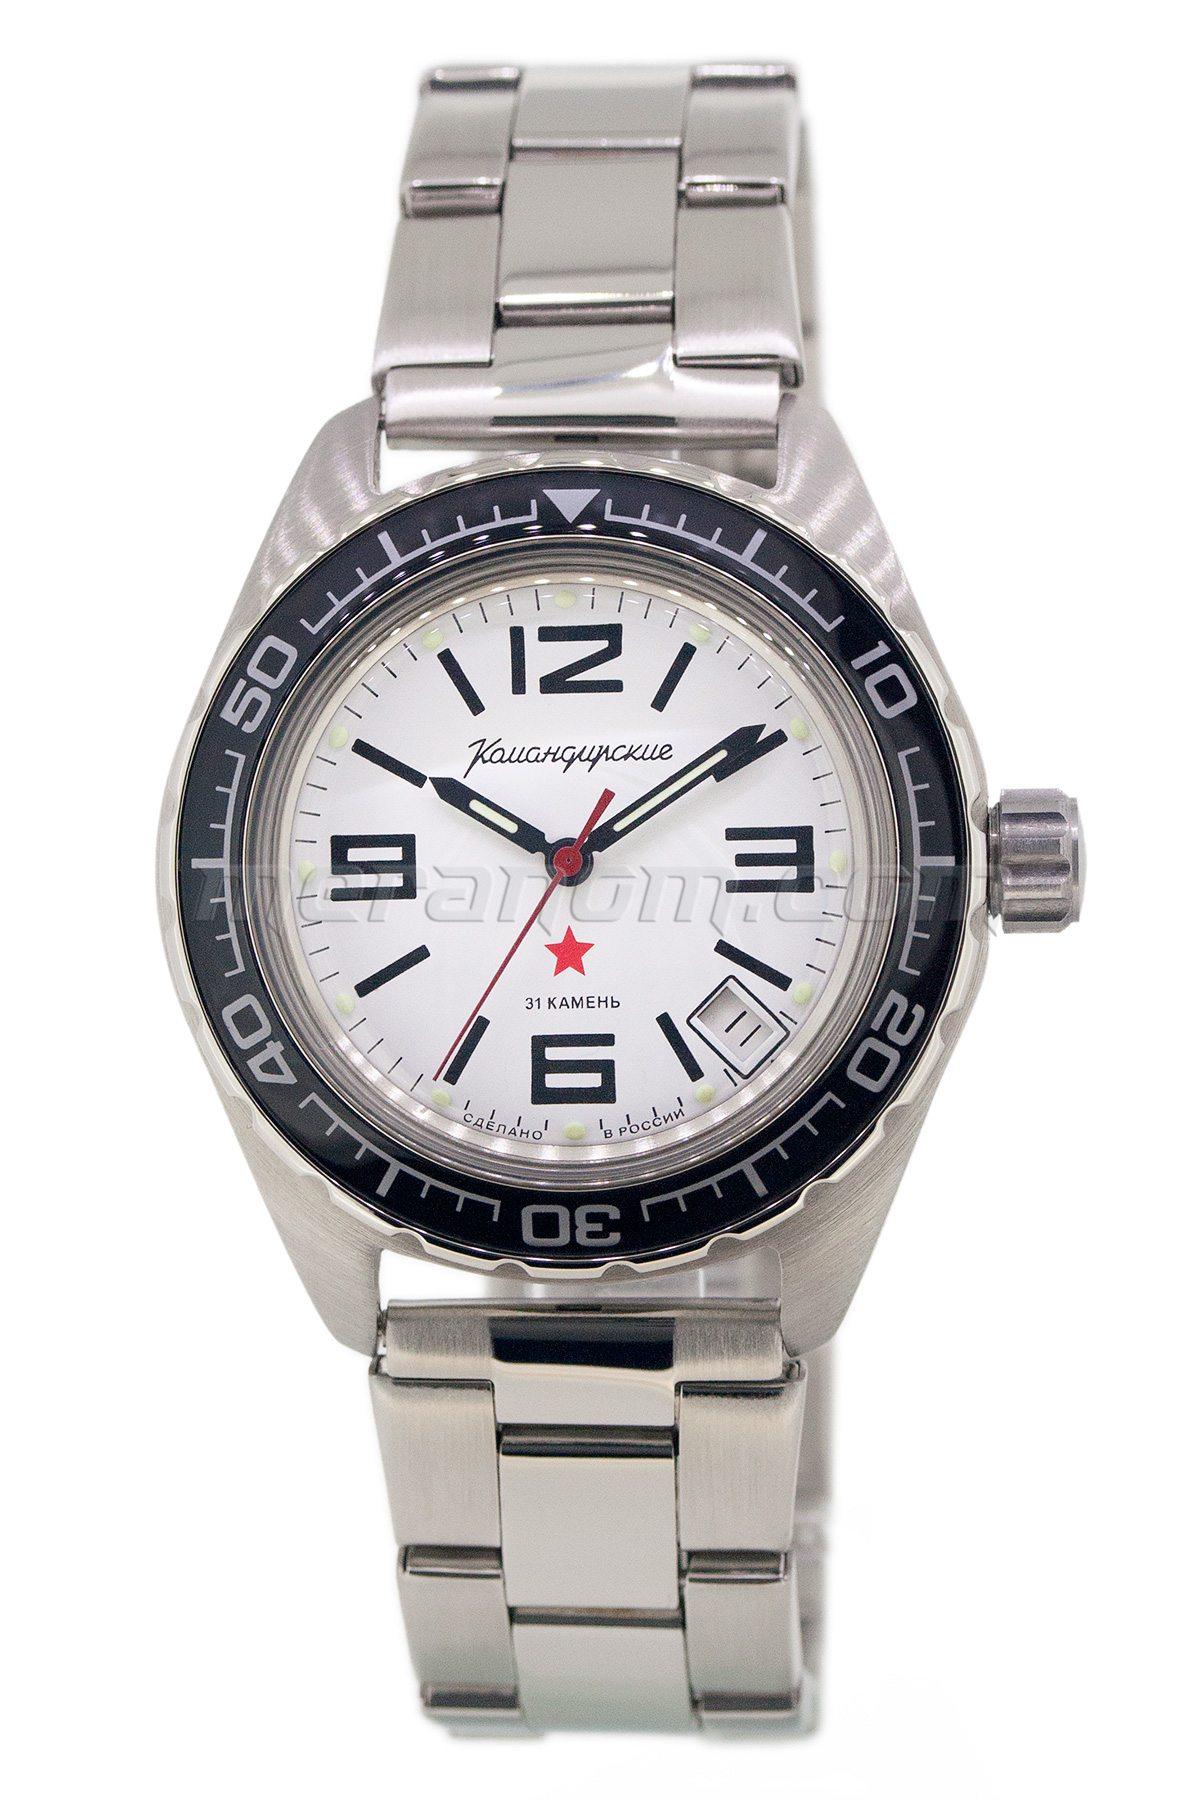 Vostok watch komandirskie 020716 buy from an authorized dealer for Komandirskie watches